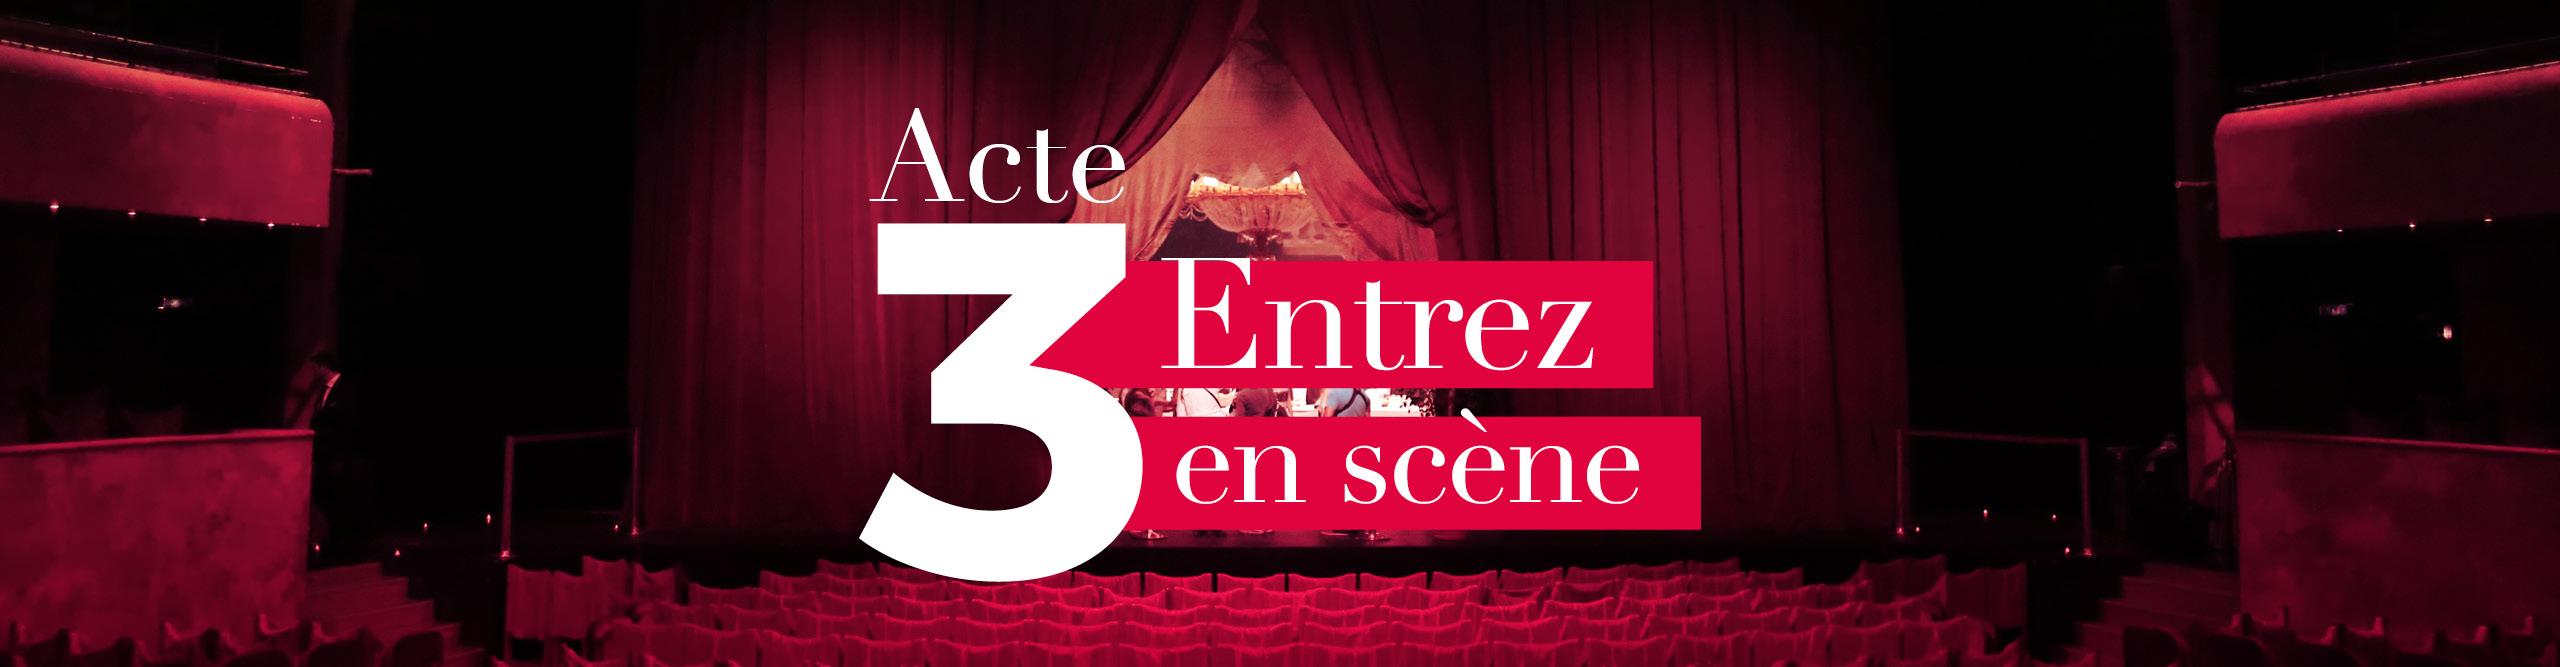 Acte 3 Entrez en scène